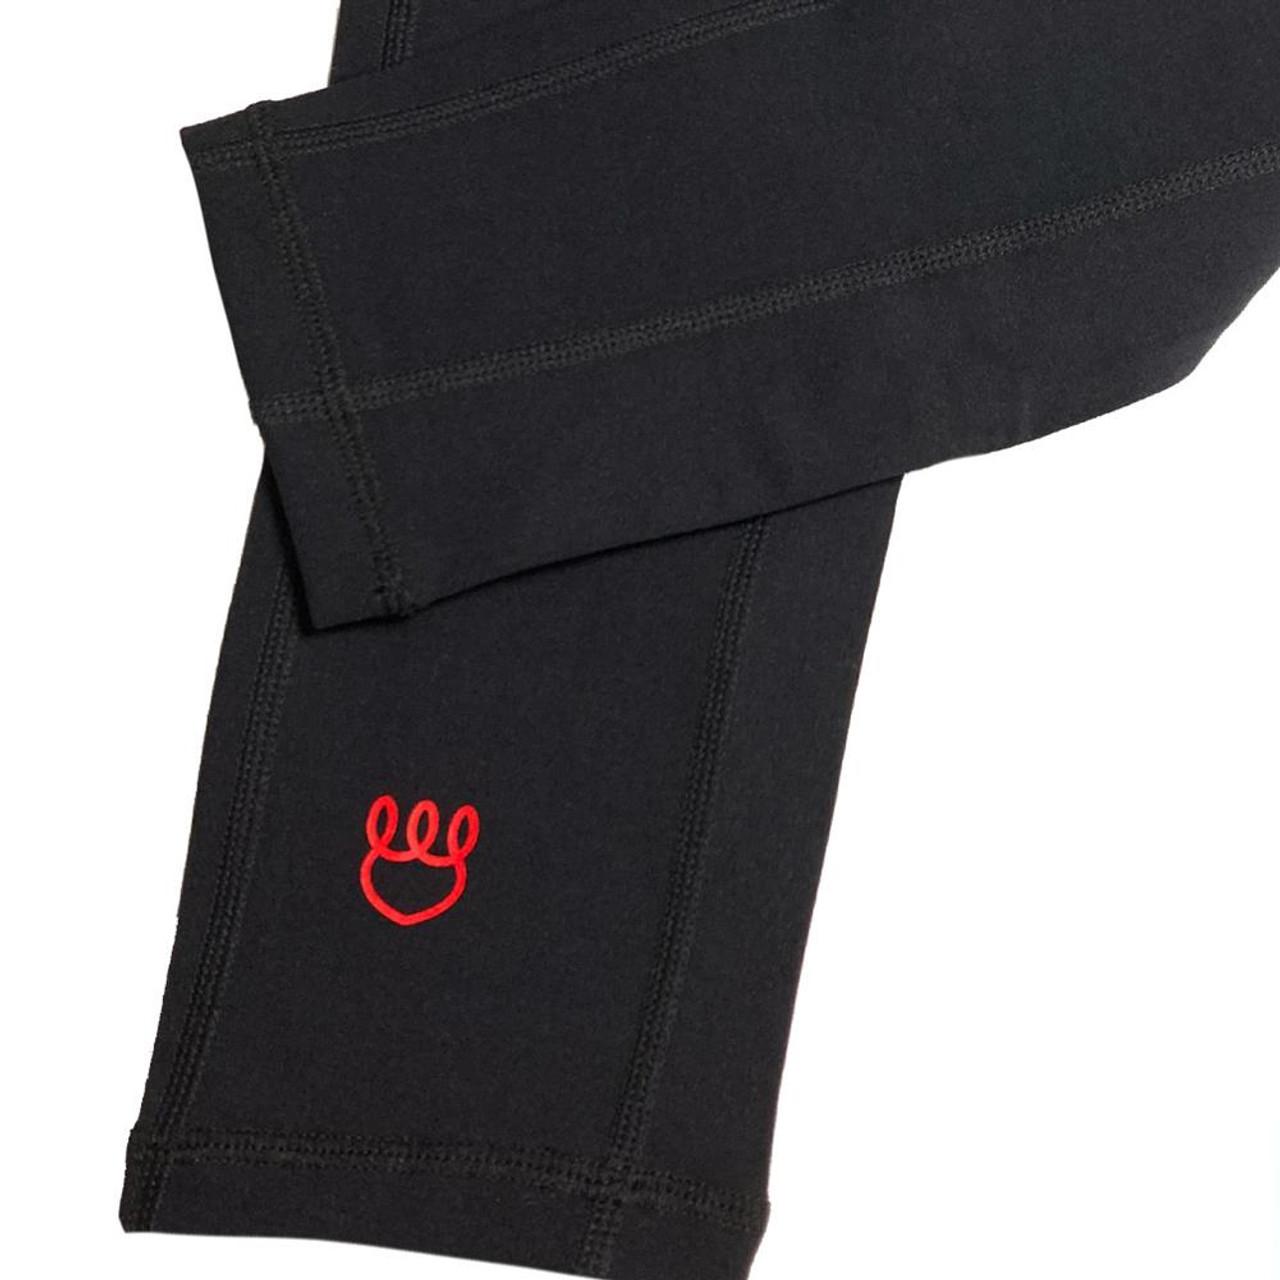 Women's University of Colorado Buffaloes Black Yoga Pants iLeggings Pocket